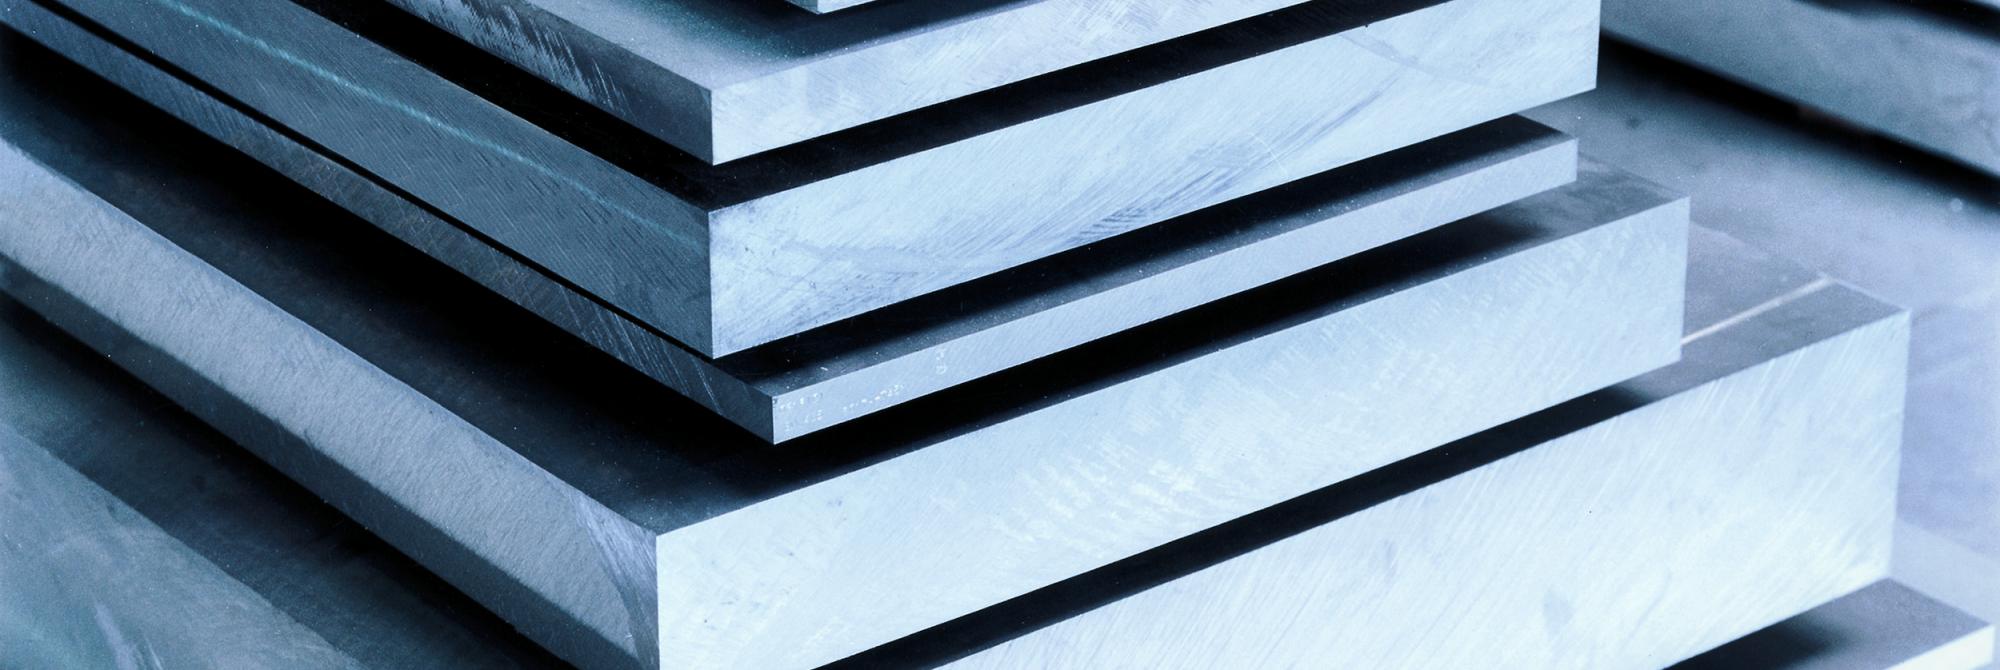 Aluminio - Metales no férricos